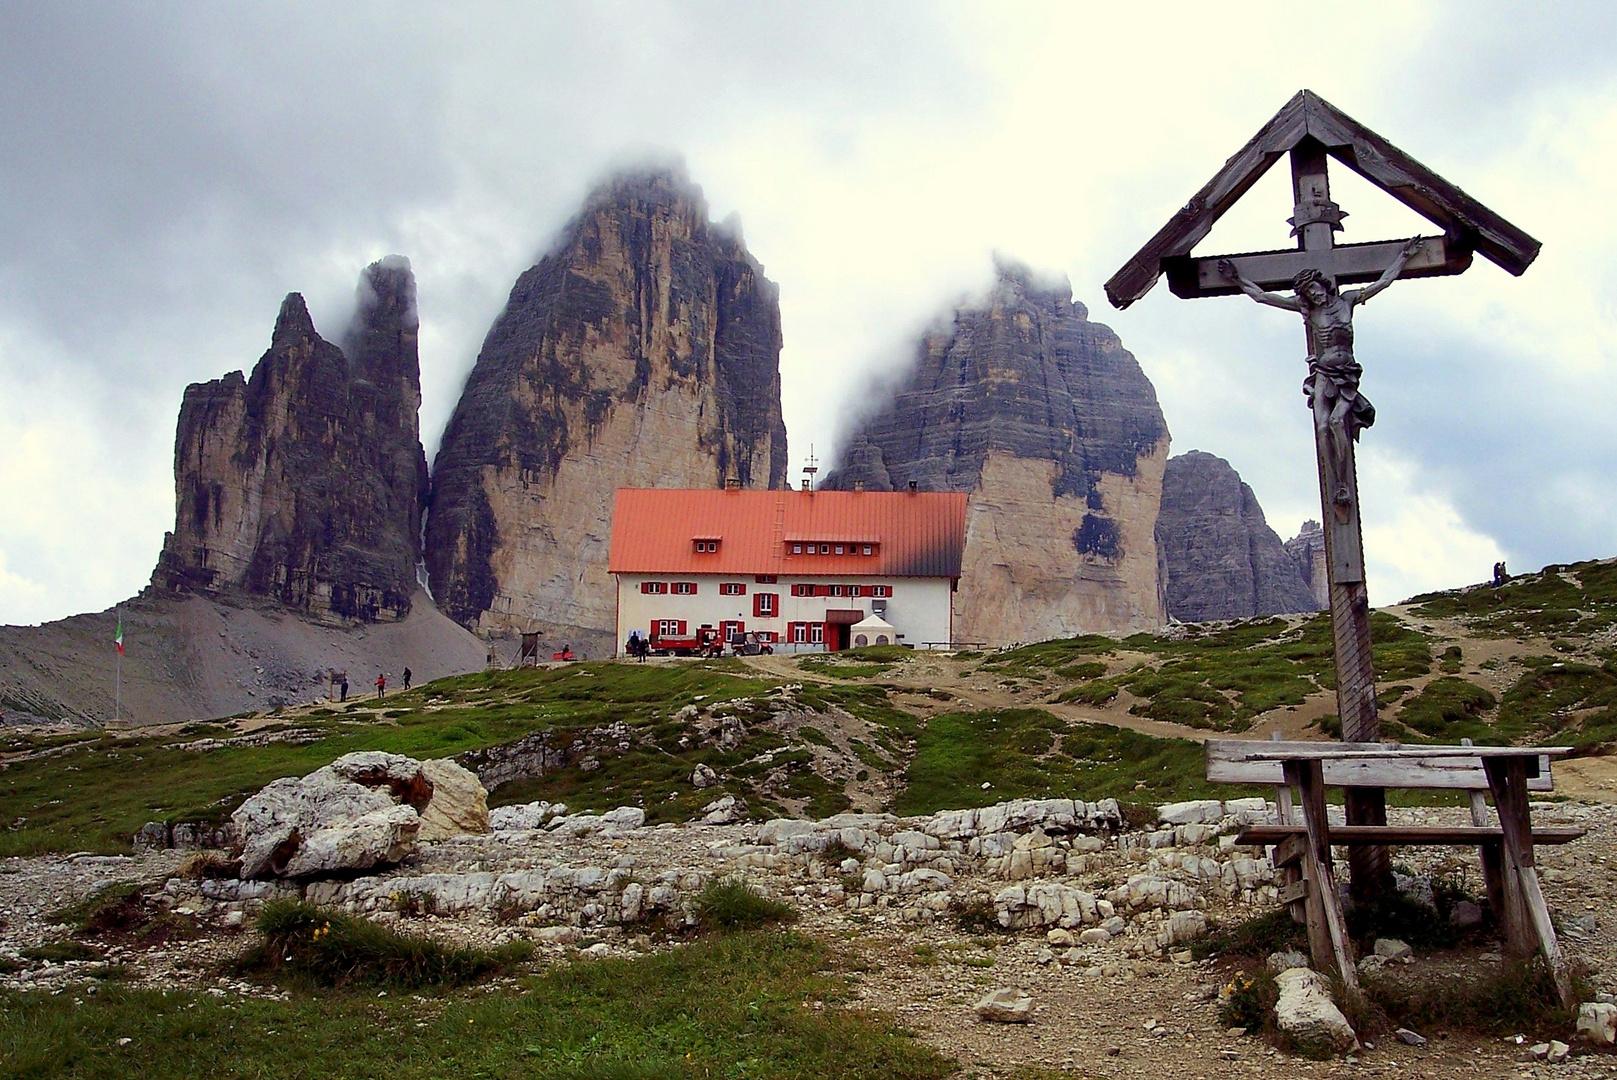 Dolomiten - Dreizinnenhütte